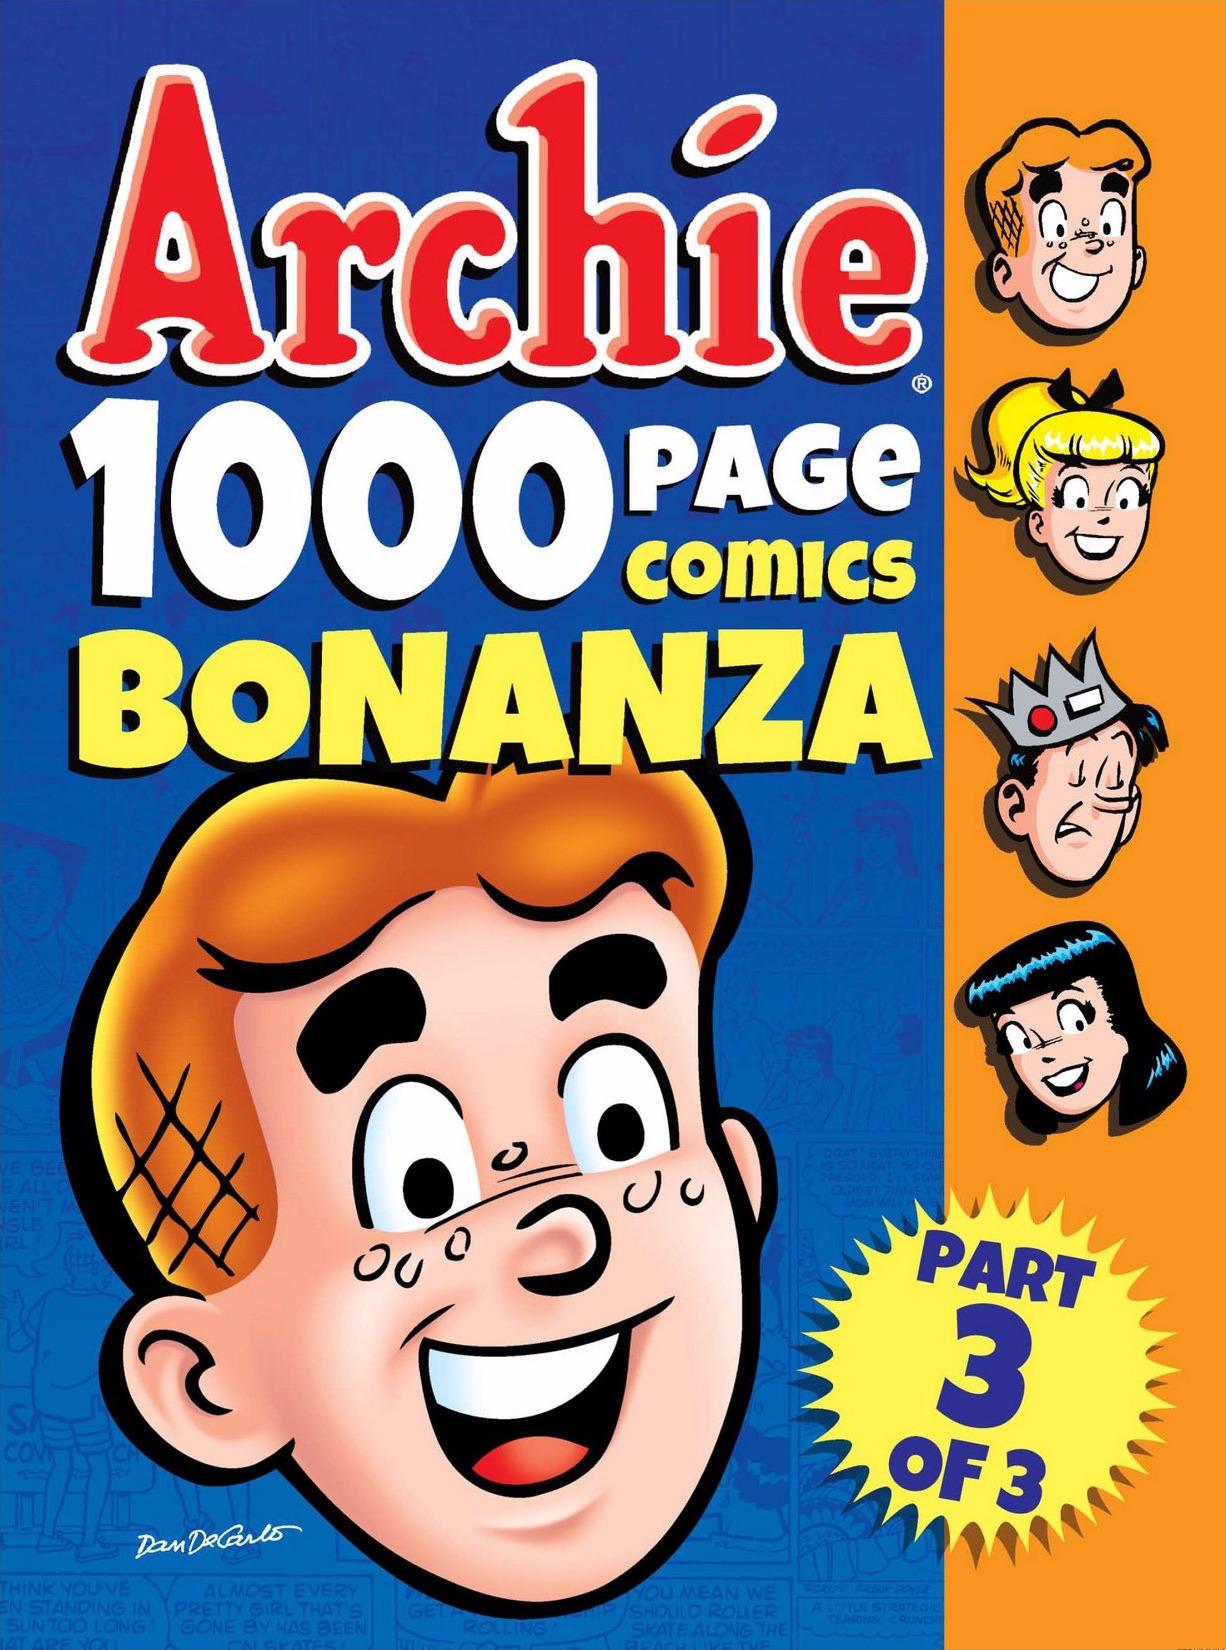 Read online Archie 1000 Page Comics Bonanza comic -  Issue #3 (Part 1) - 1